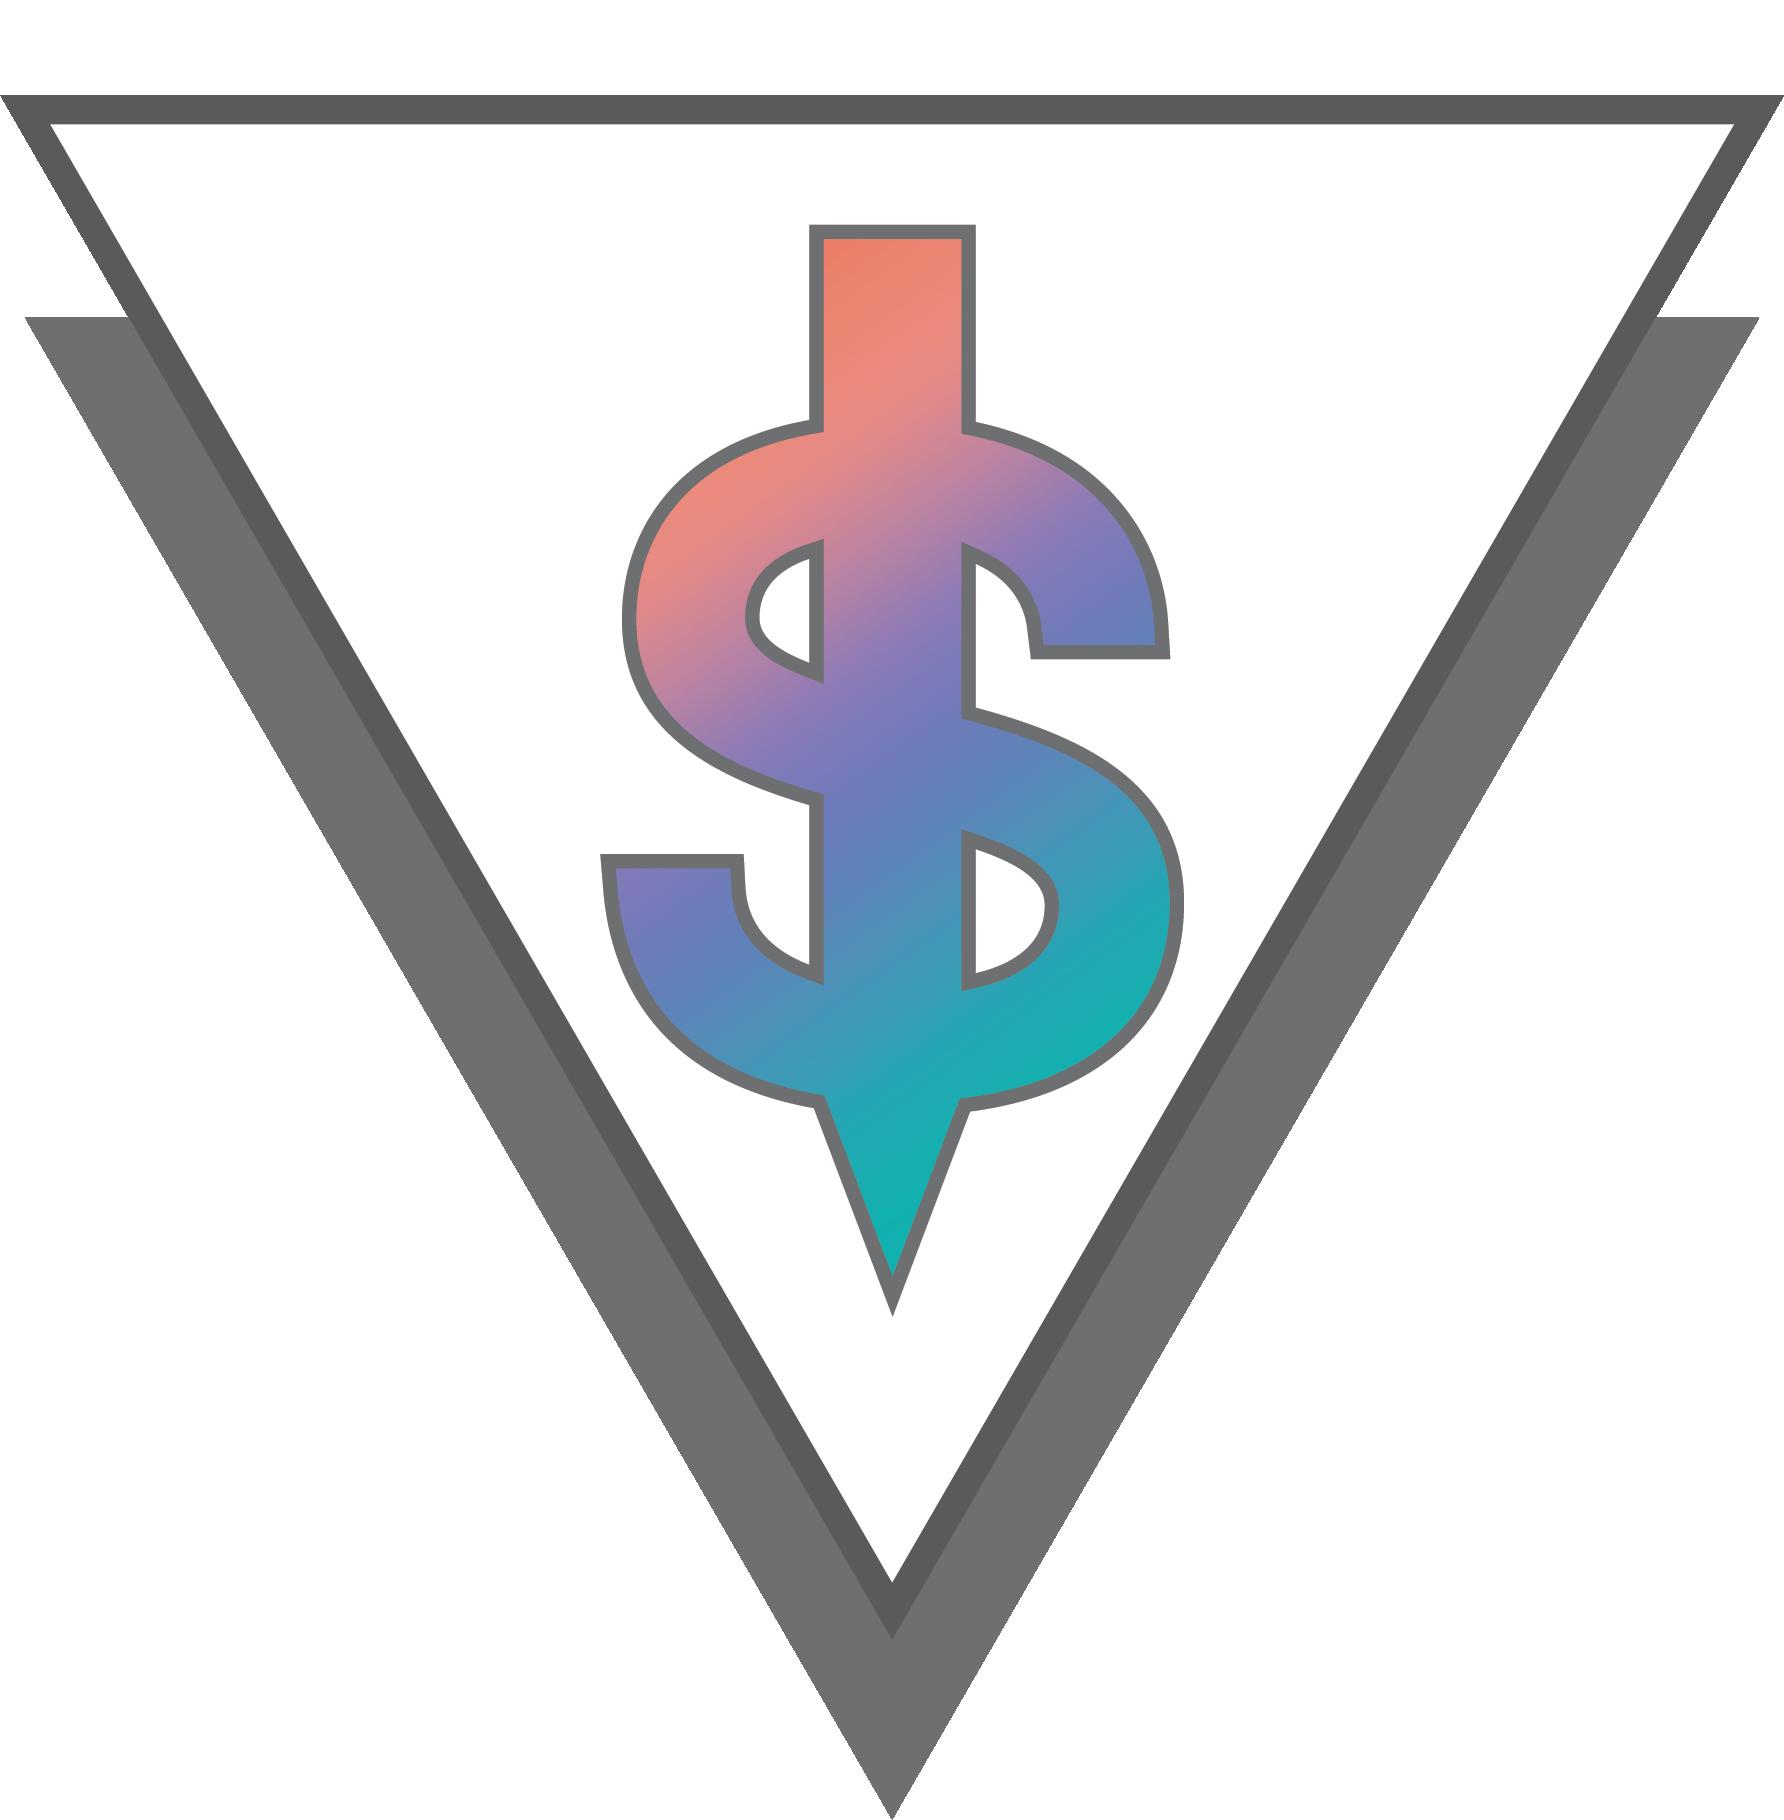 andro-dollar-final-logo